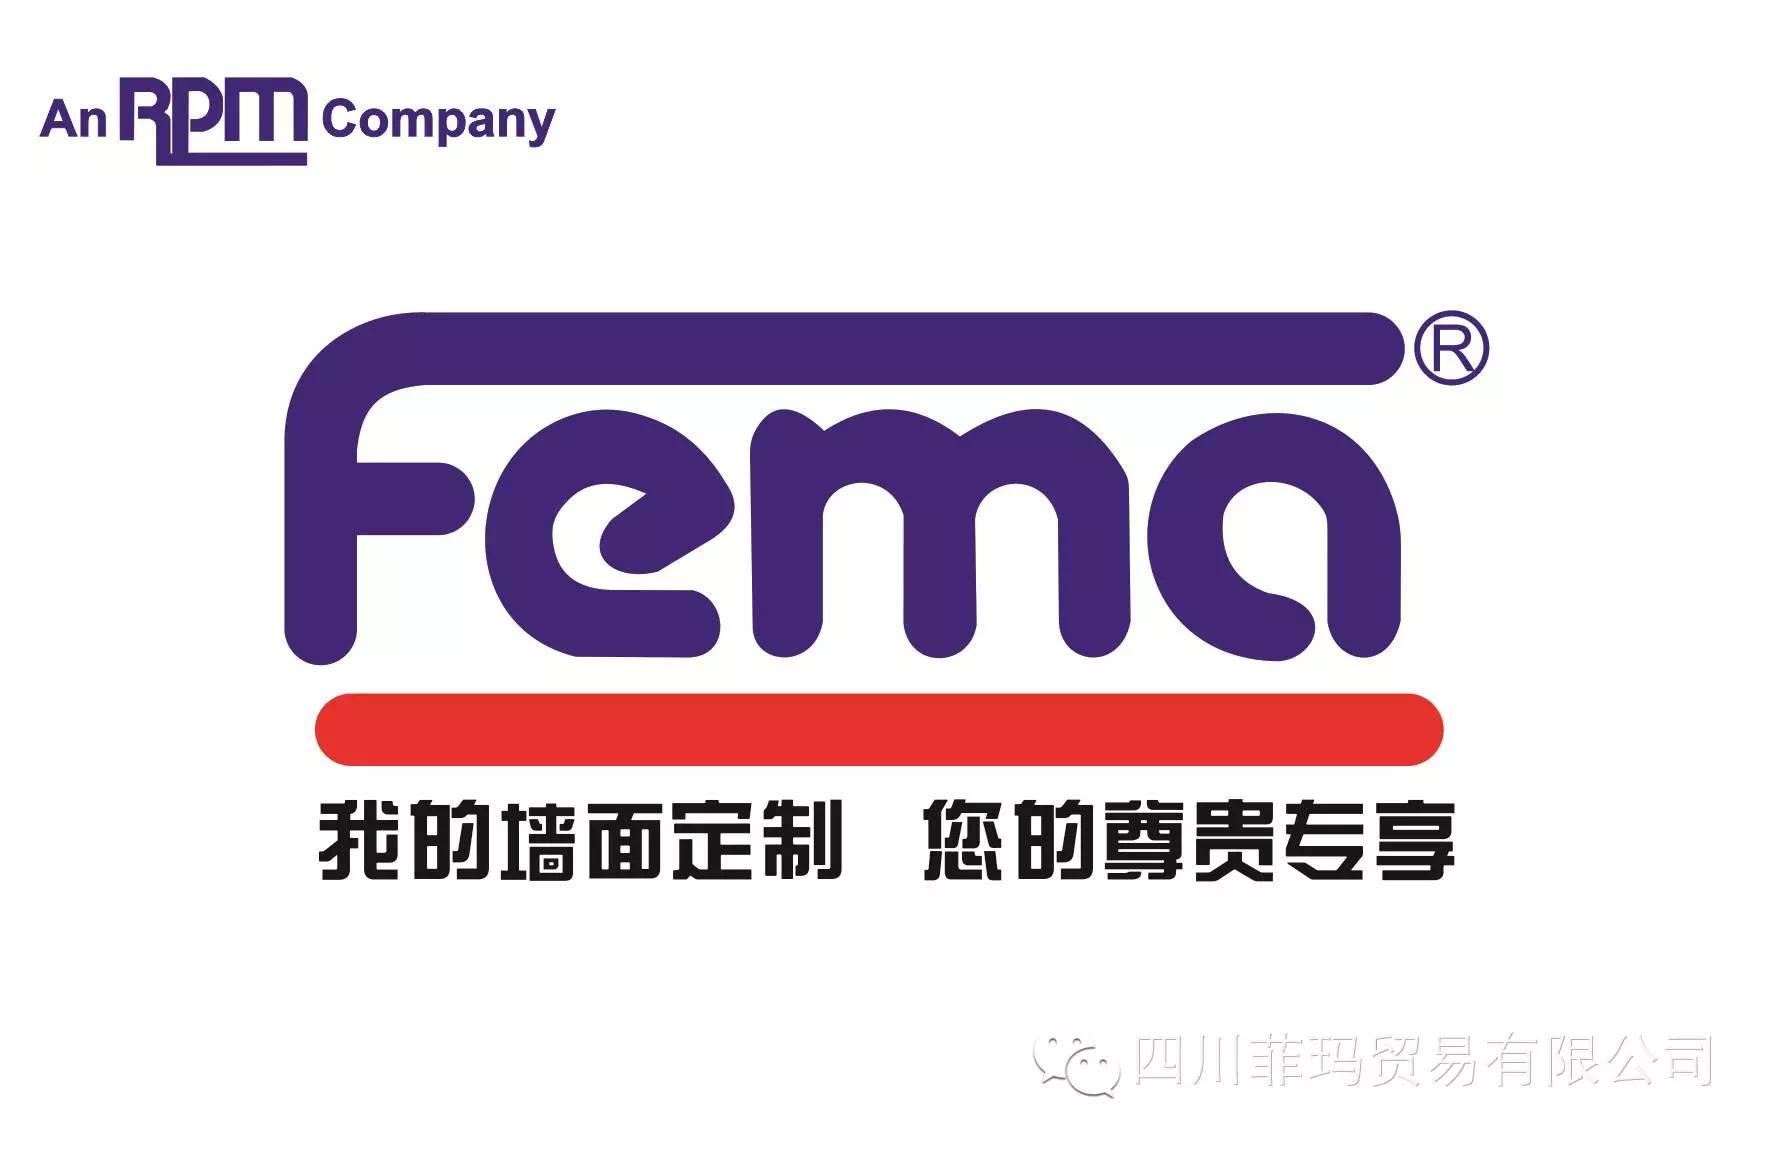 logo logo 标志 设计 图标 1774_1152